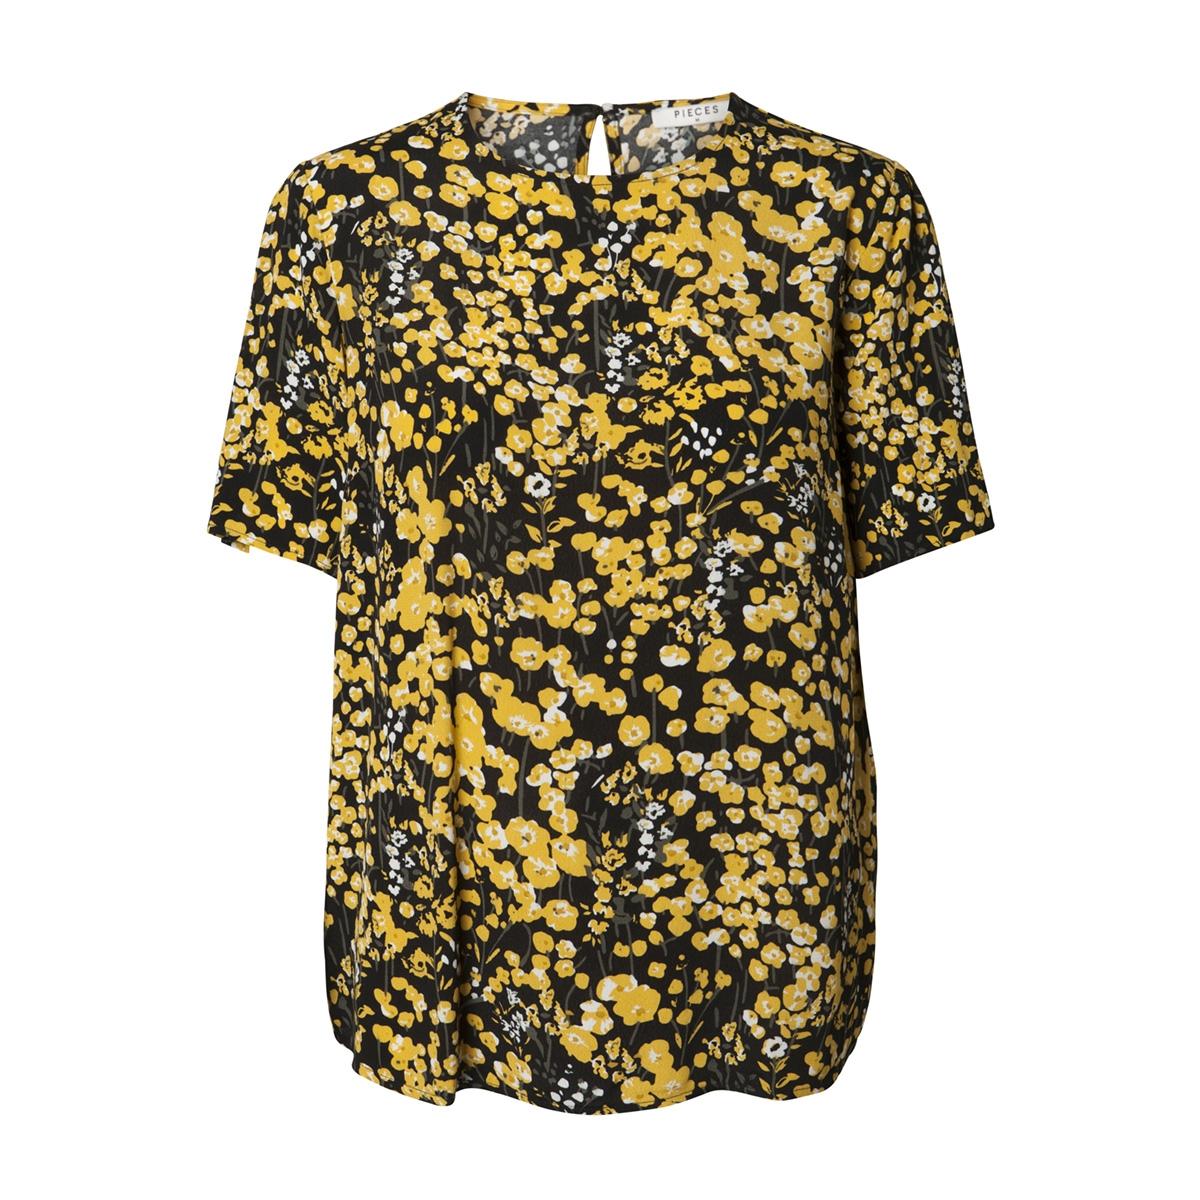 pclonni ss top pb 17092684 pieces t-shirt black/buttercup